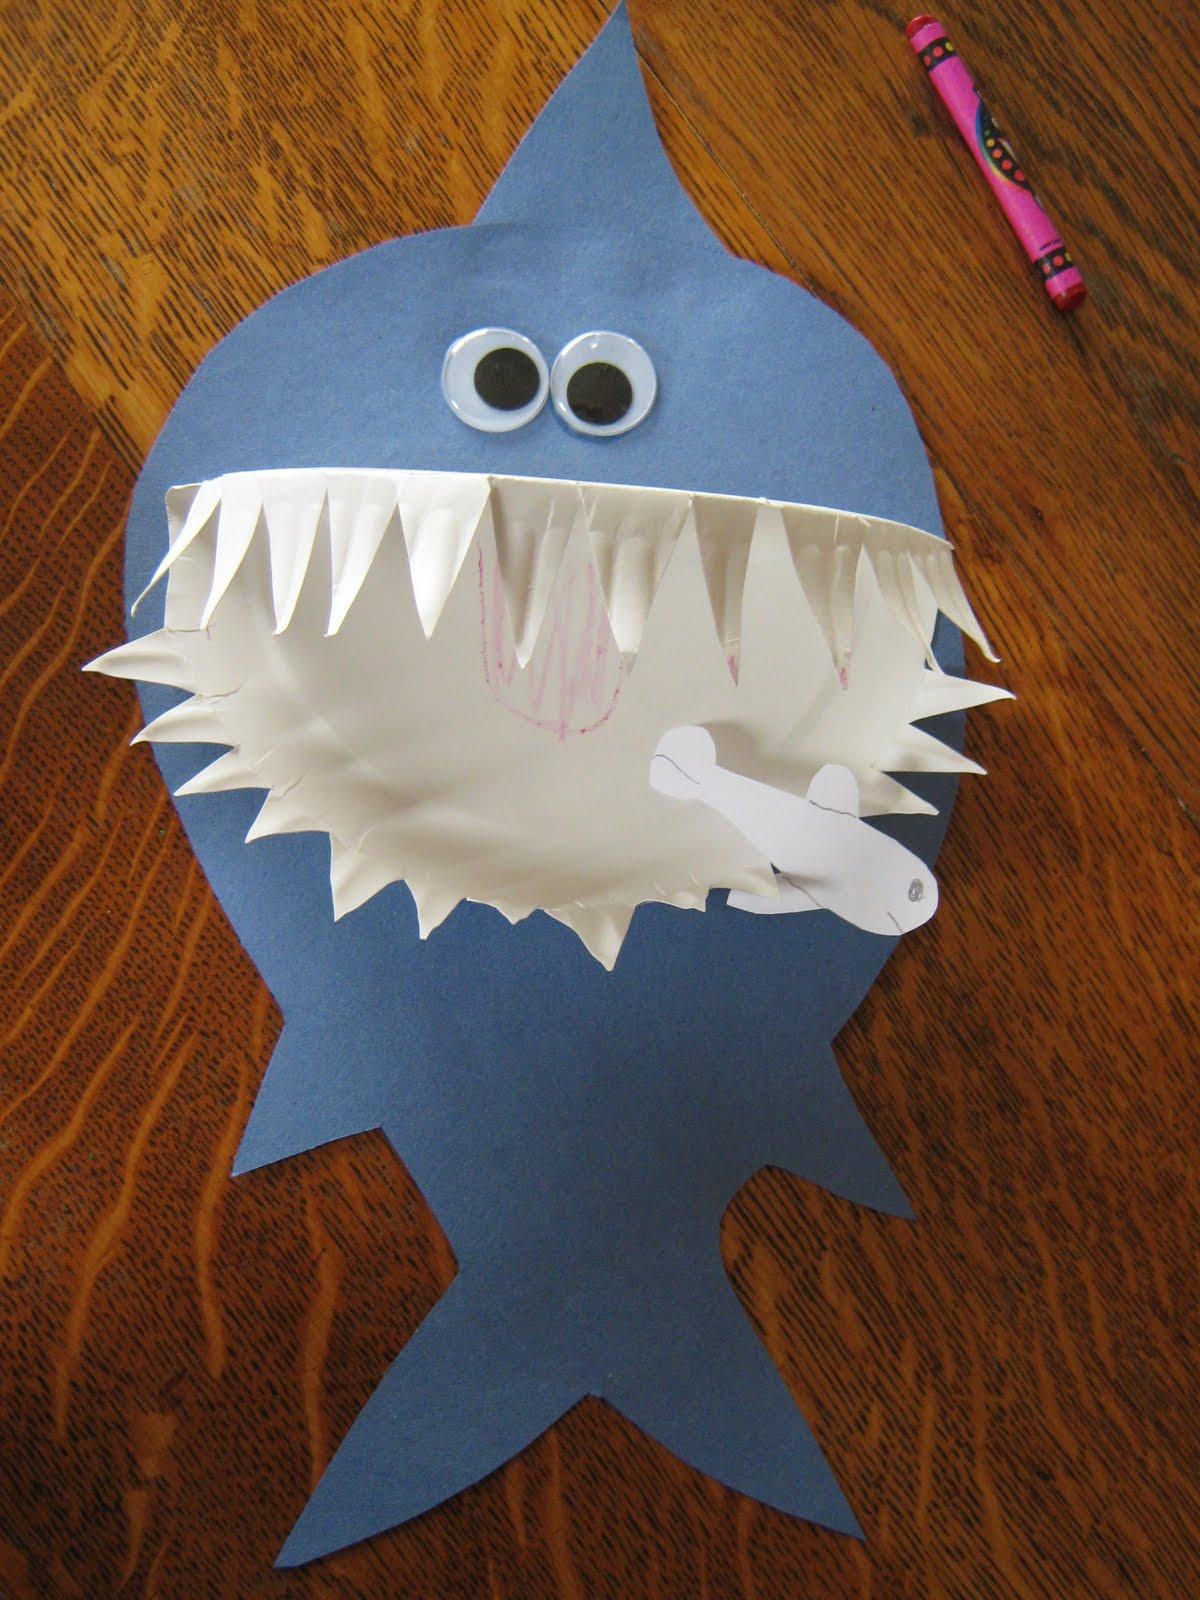 Fun Craft For Preschoolers  Paper Plate Shark